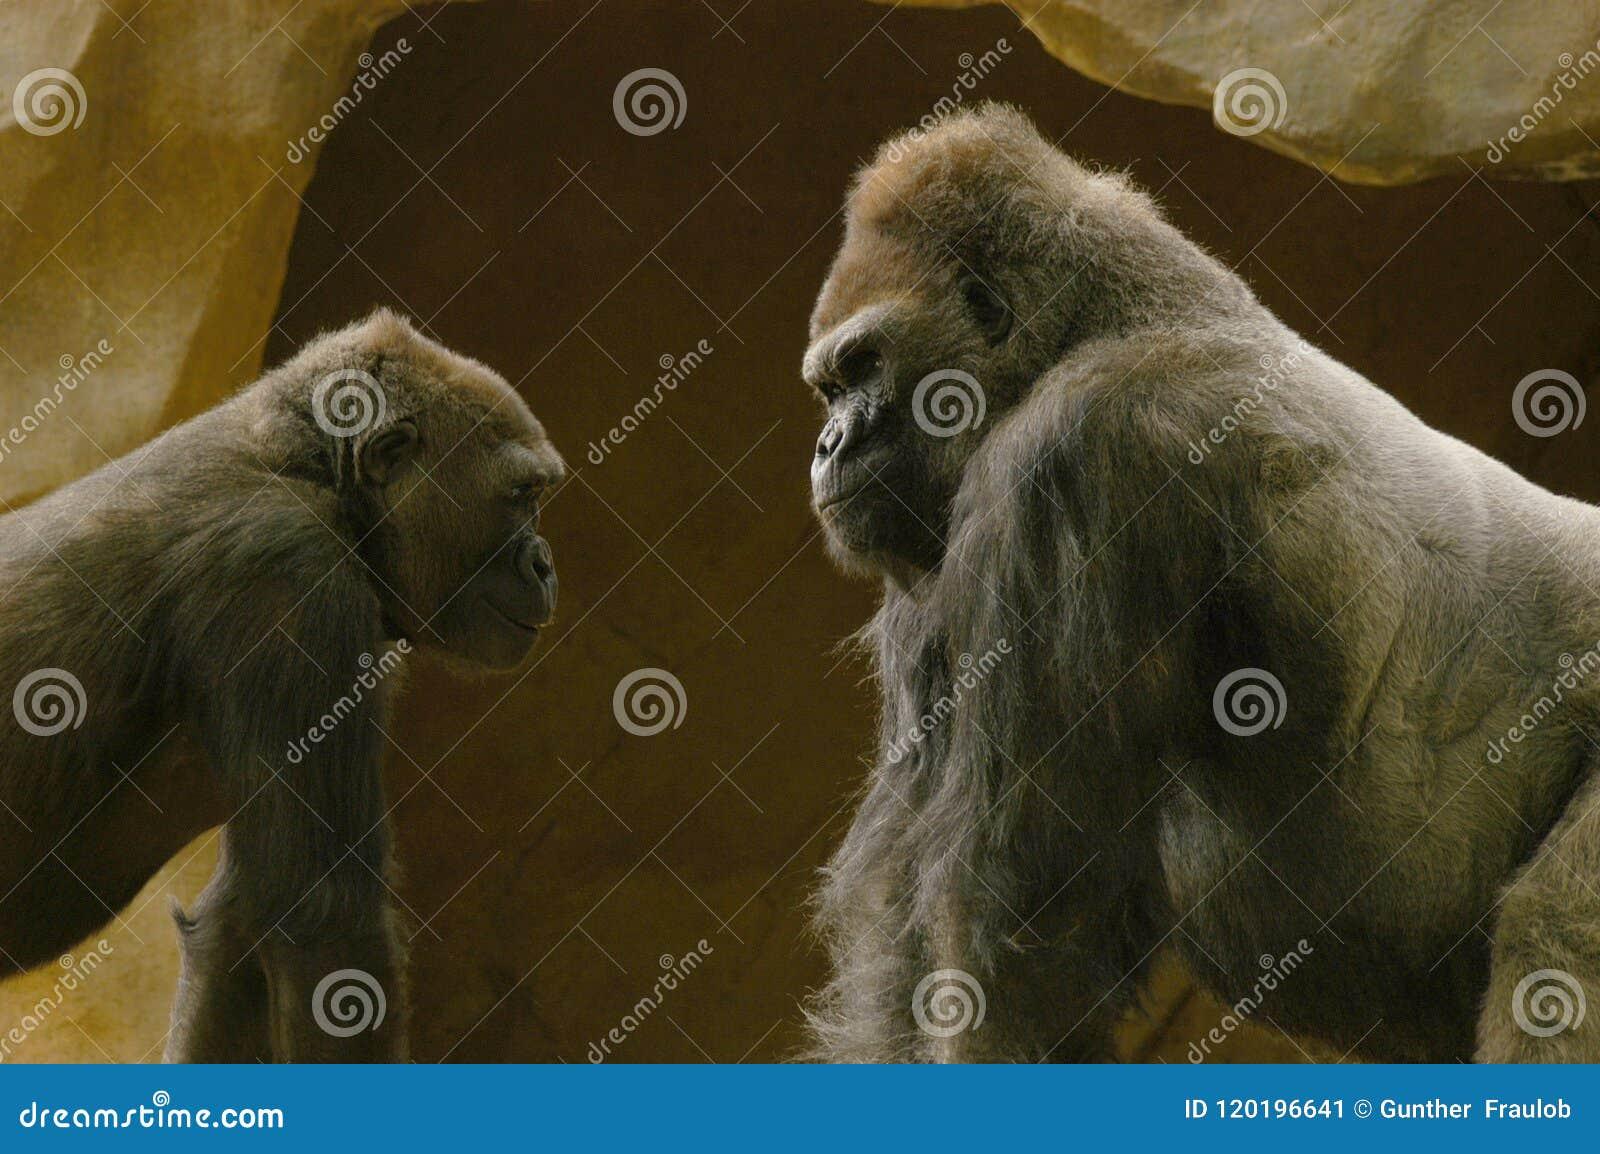 Silverback Gorilla giving a teaching moment to younger gorilla.